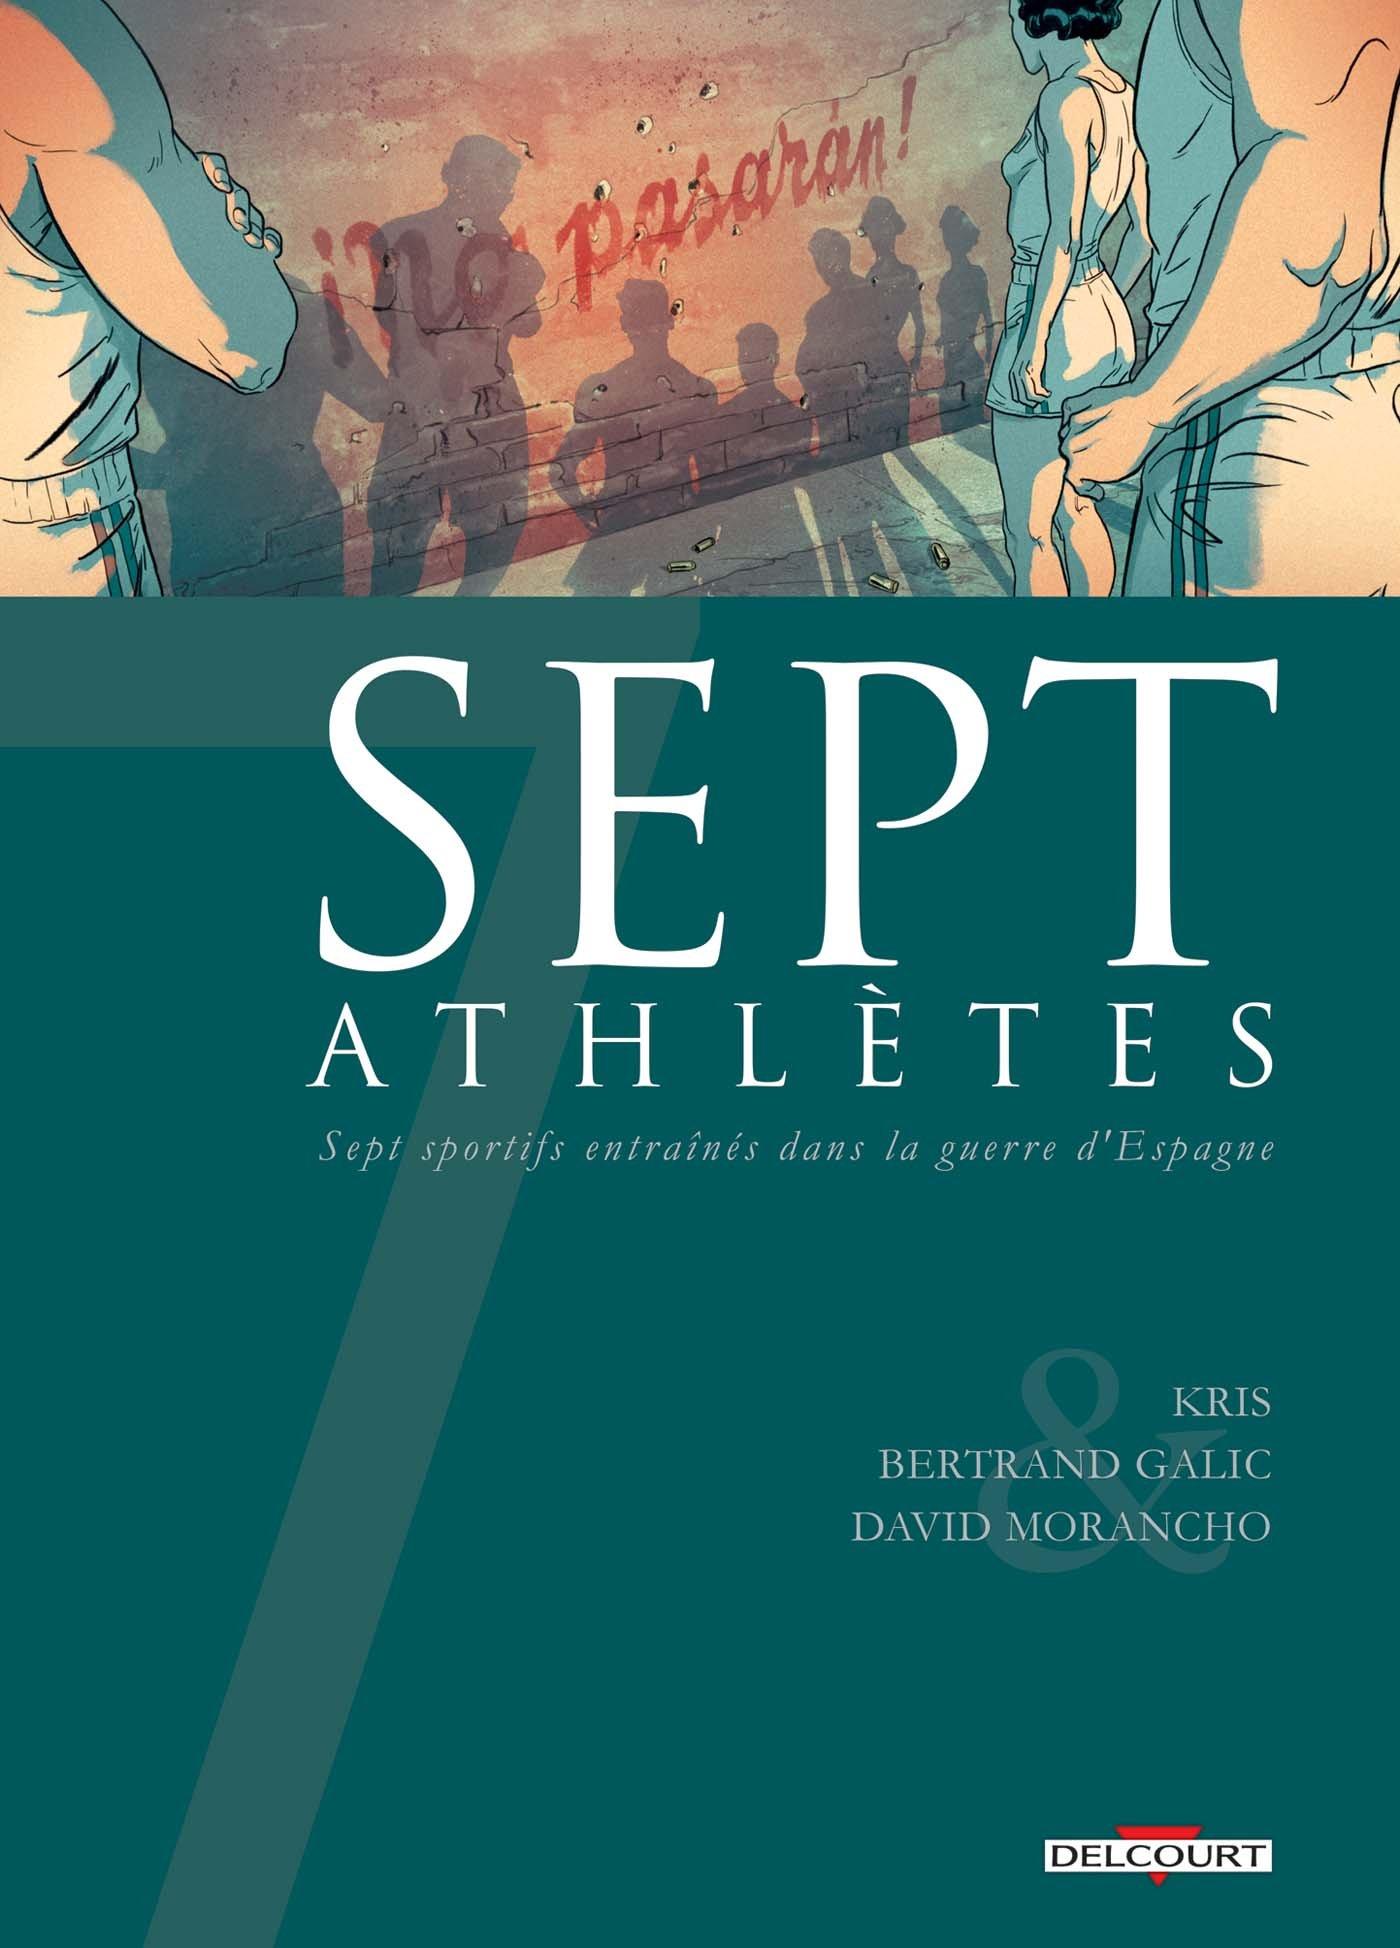 Sept 20 - 7 athlètes